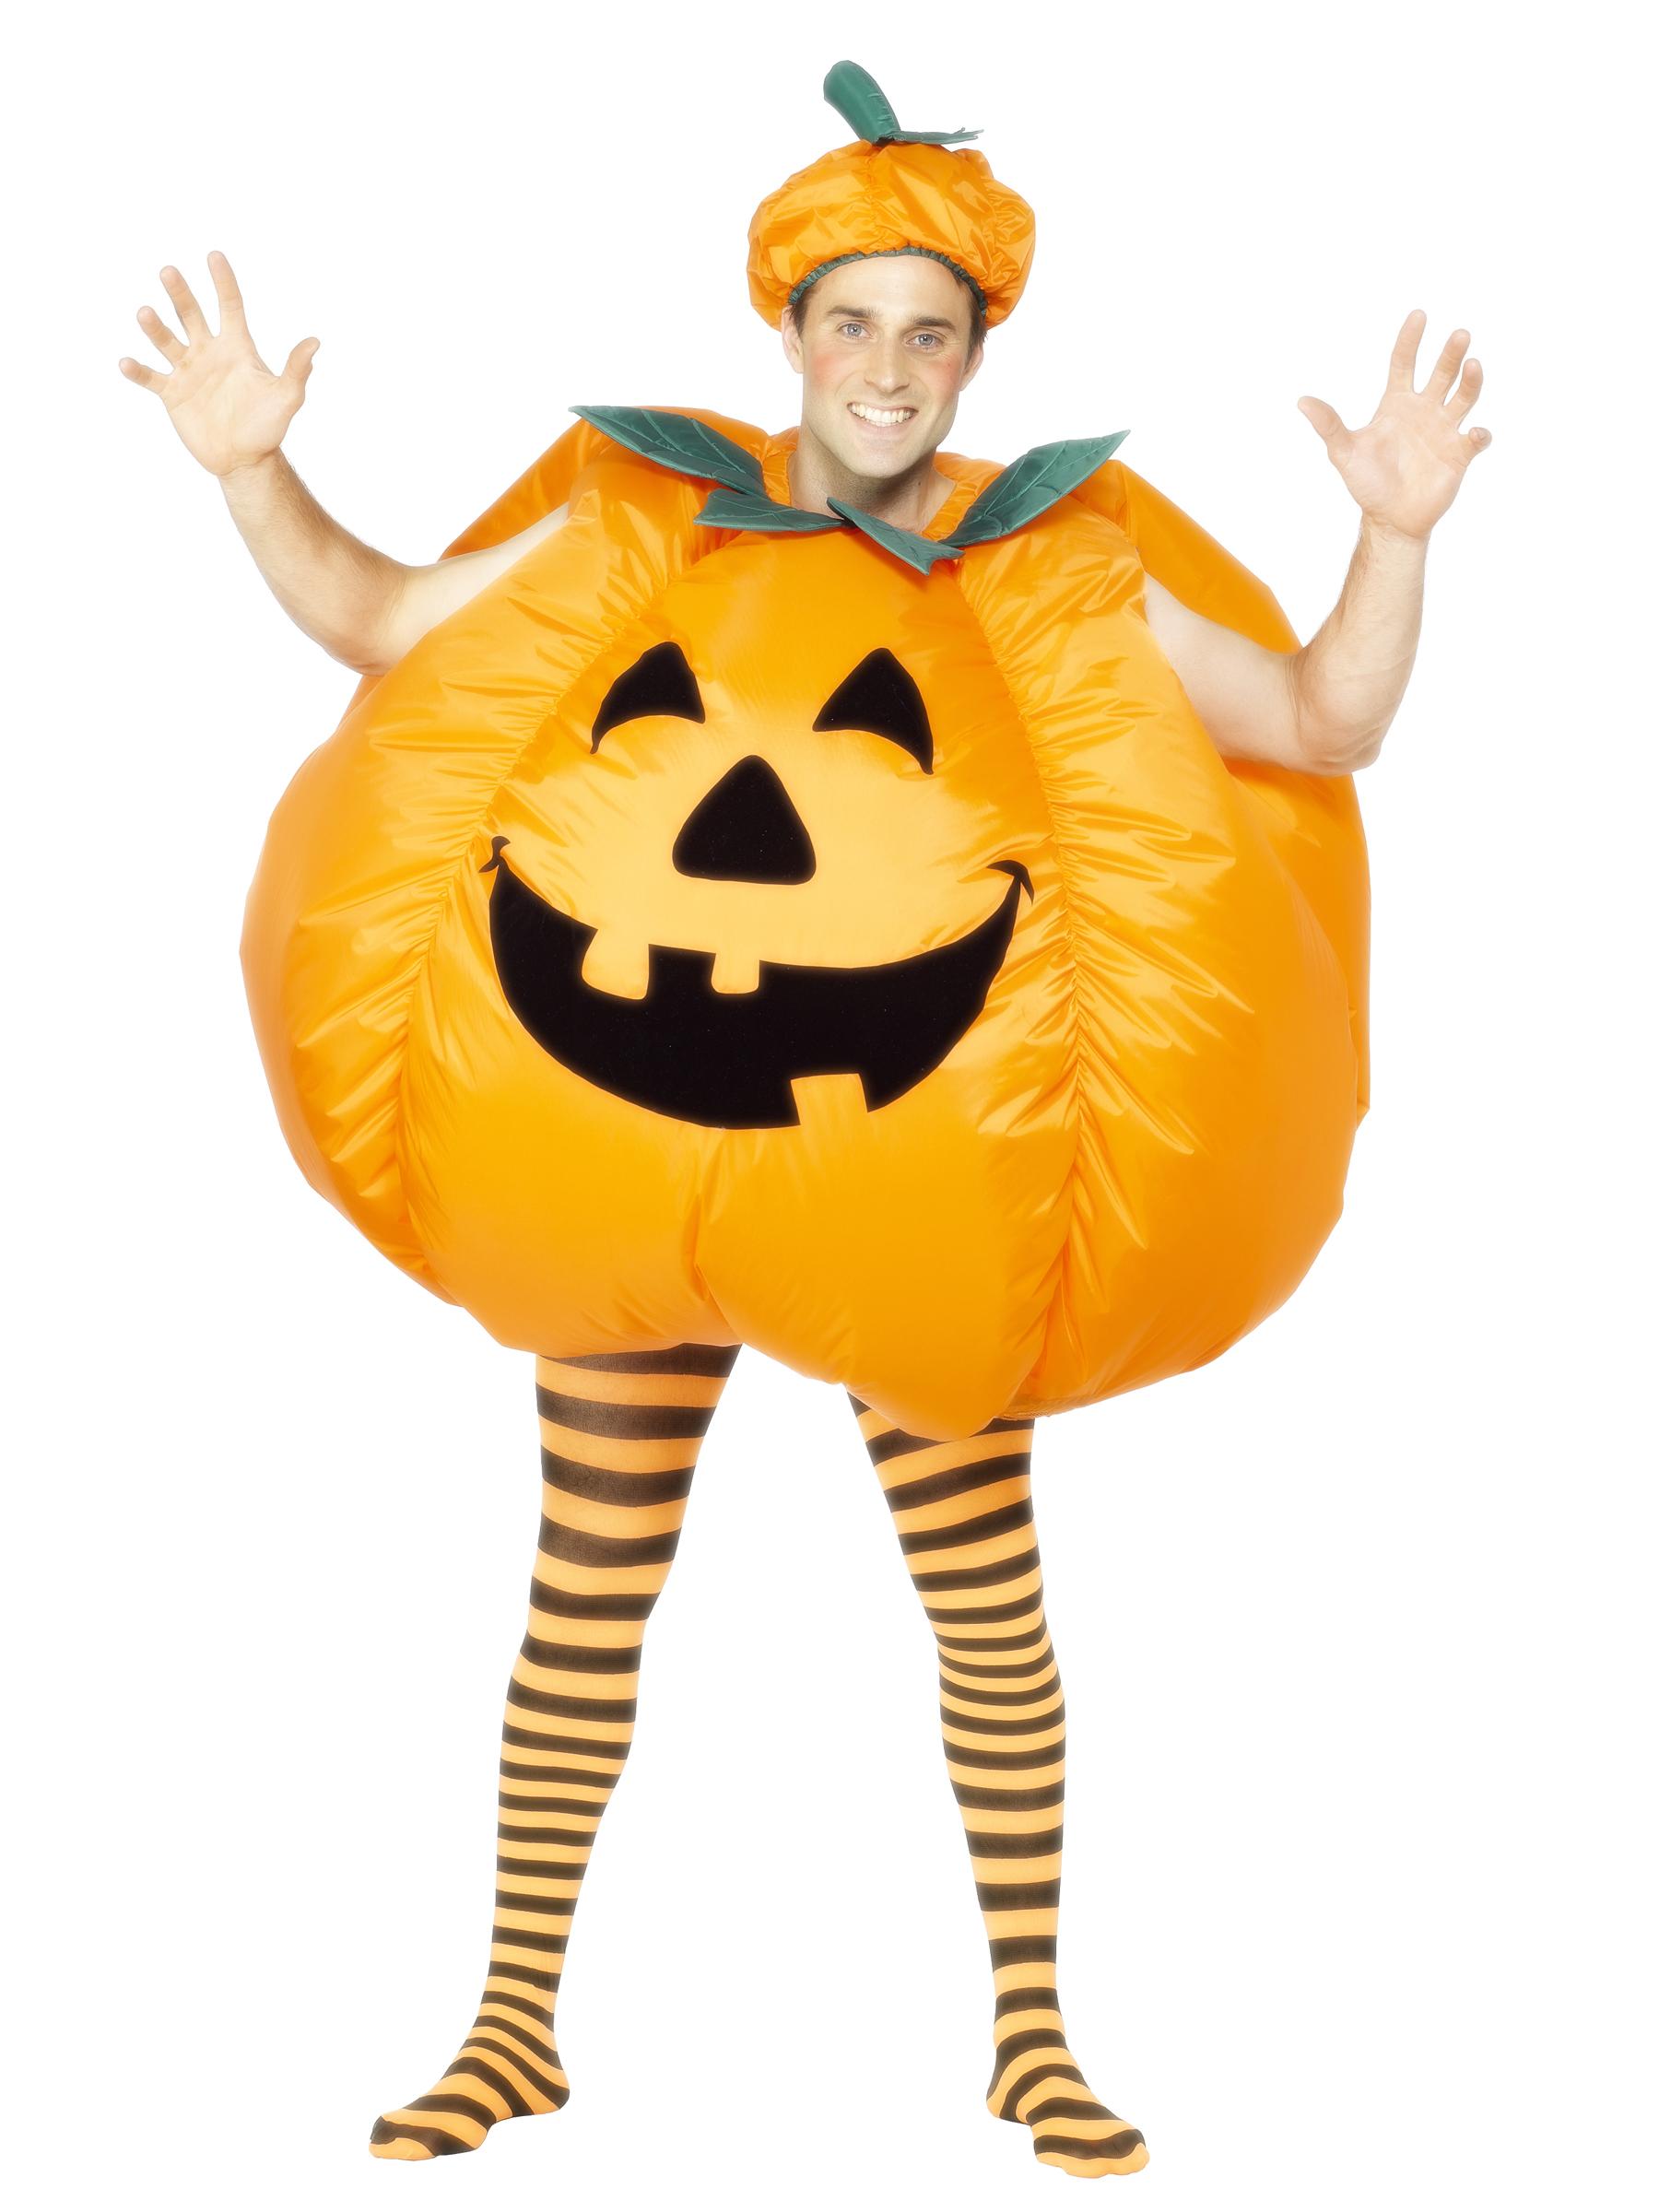 inflatable halloween pumpkin costume for adults. Black Bedroom Furniture Sets. Home Design Ideas